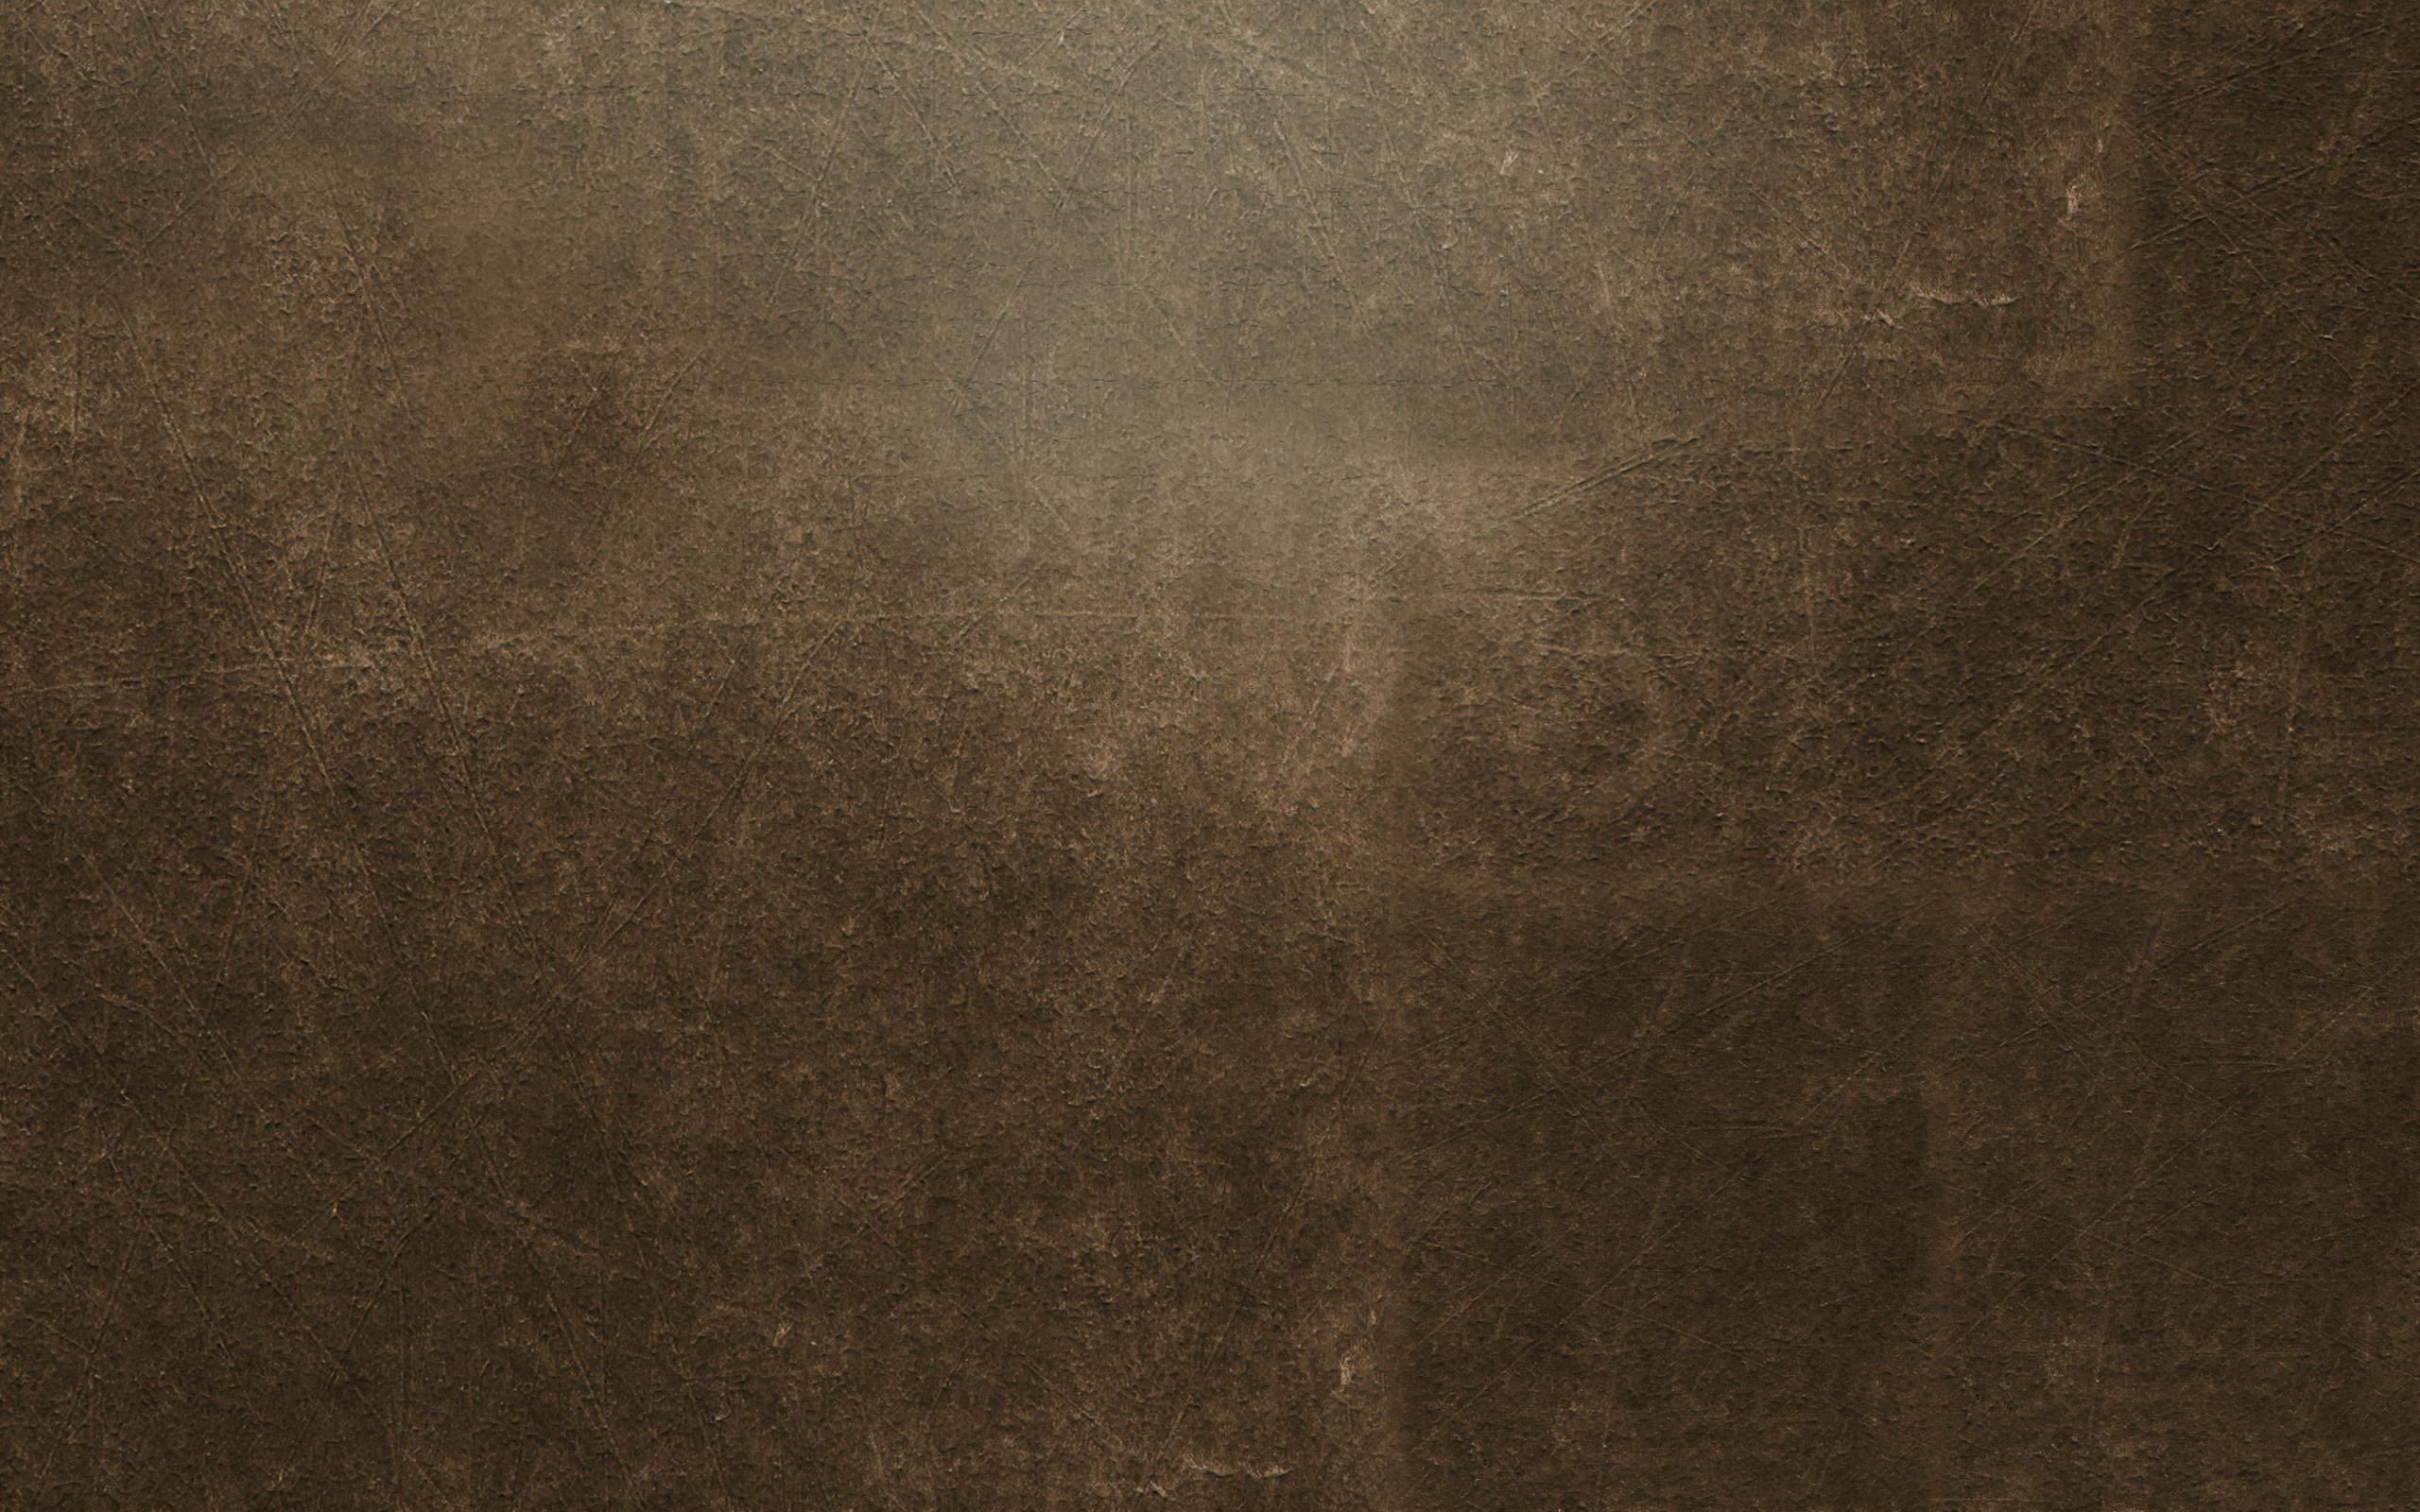 Textures Background Wallpaper Textures, Background